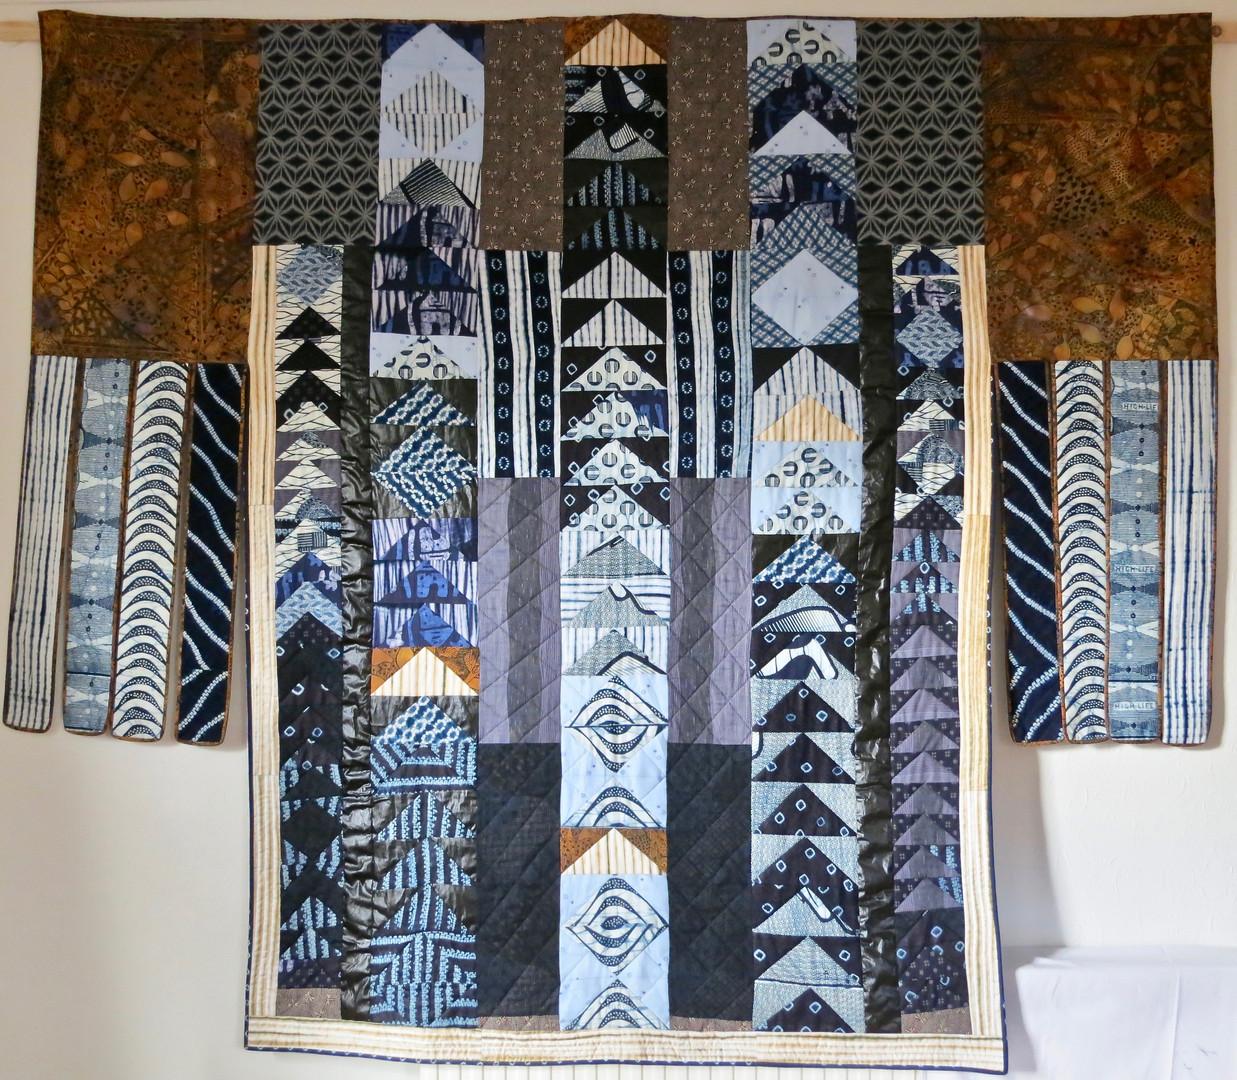 Kimono Quilt 7.5' x 6'.jpeg